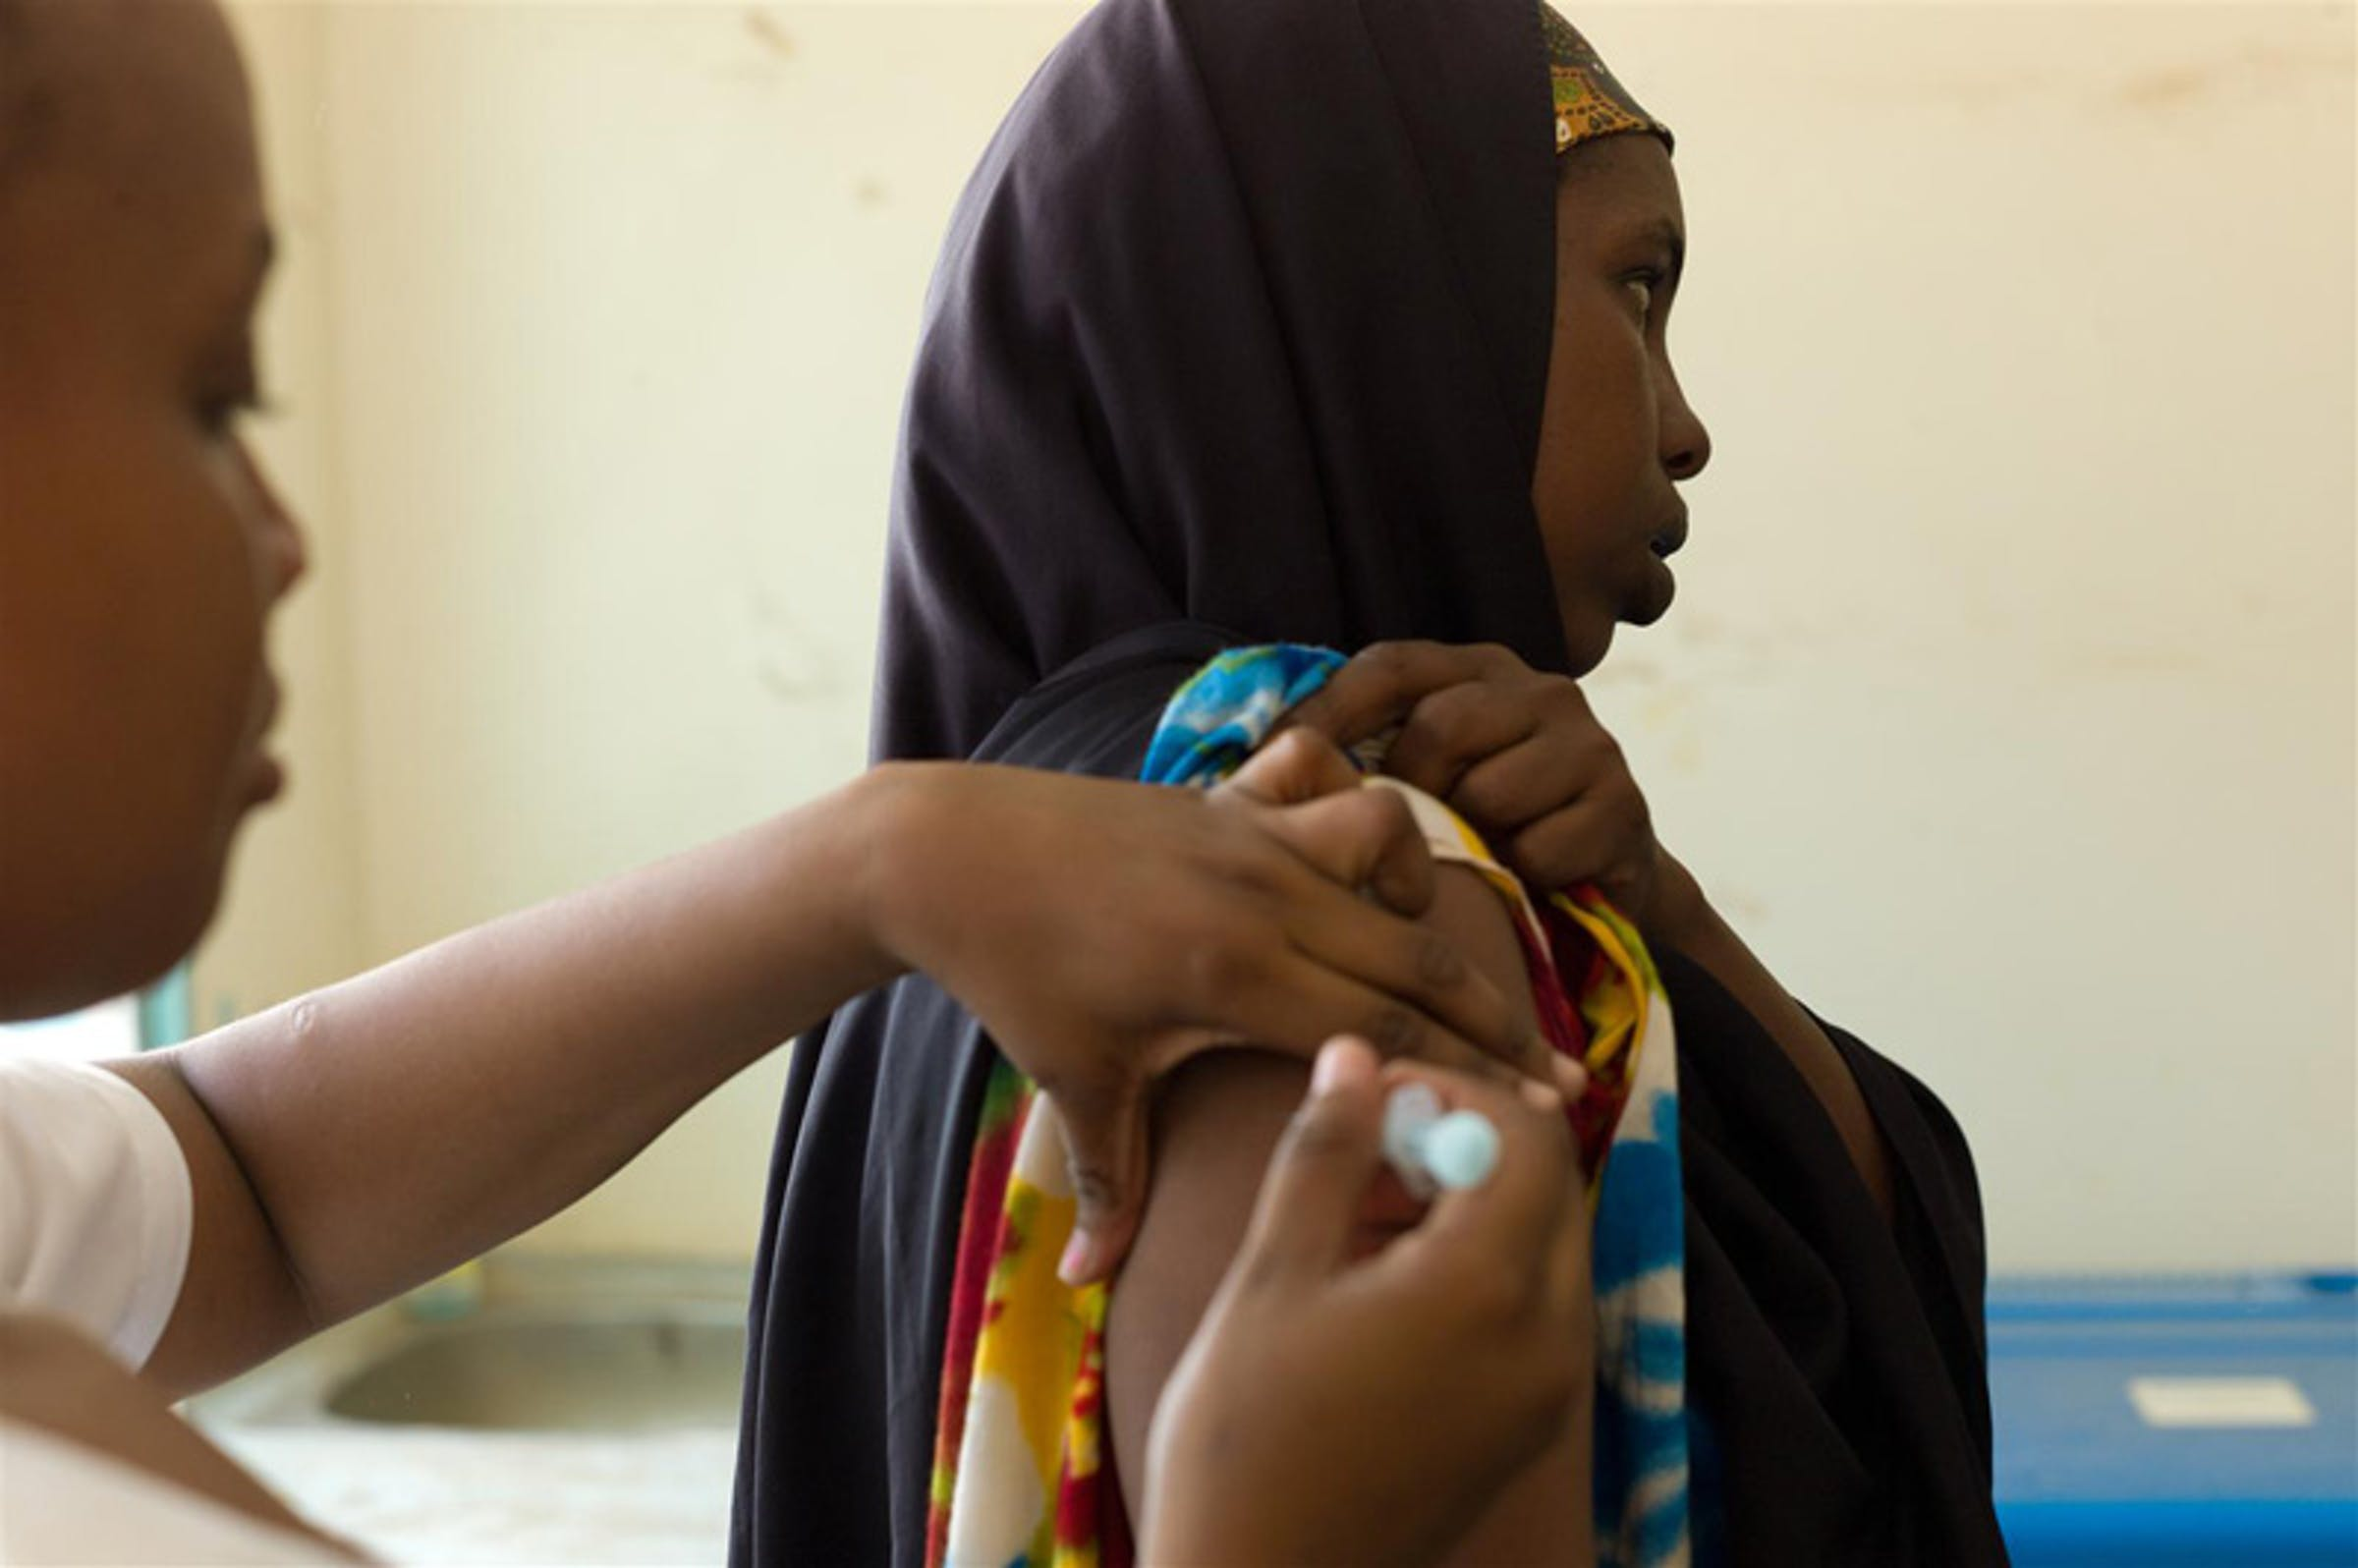 Una donna incinta riceve una dose di vaccino antitetanico nell'ospedale di Garissa (Kenya). Il Kenya è uno dei 28 Stati oggi certificati liberi dal tetano - ©UNICEF Kenya/2011-0055/Nesbitt